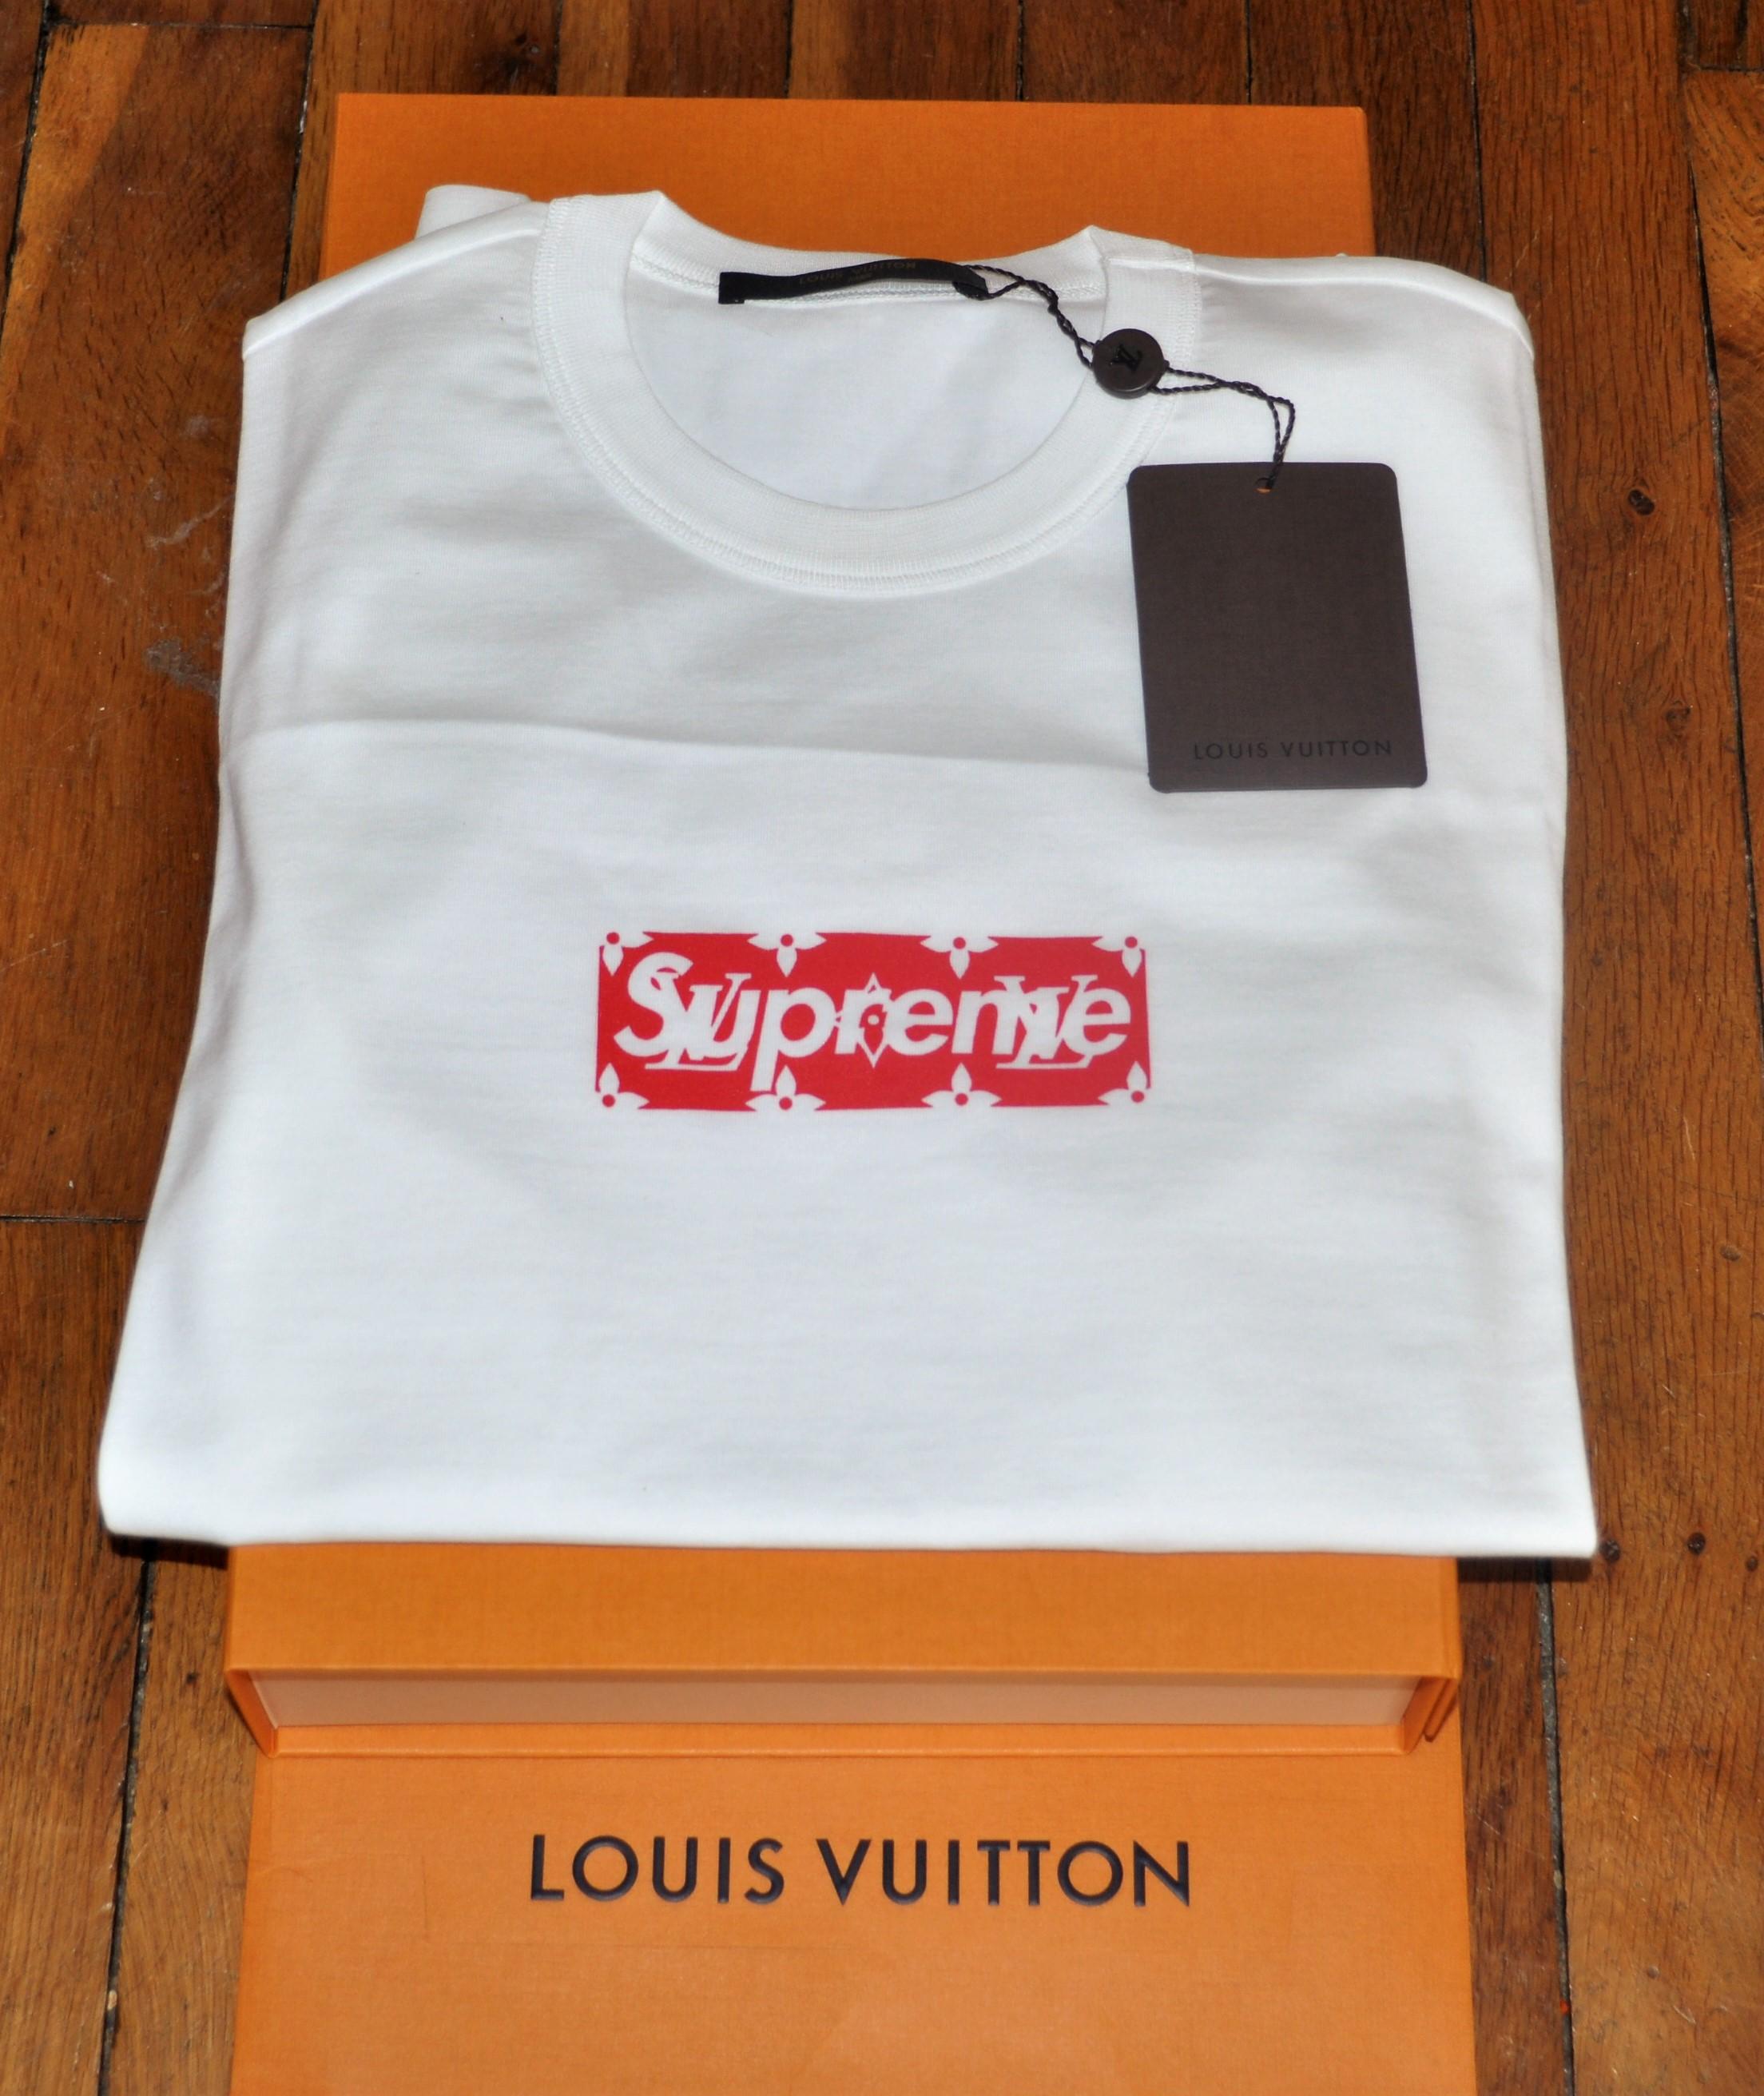 27c9c397da8 Supreme Louis Vuitton X Supreme Tee Box Logo BOGO White Red Monogram XS  Size xs - Short Sleeve T-Shirts for Sale - Grailed